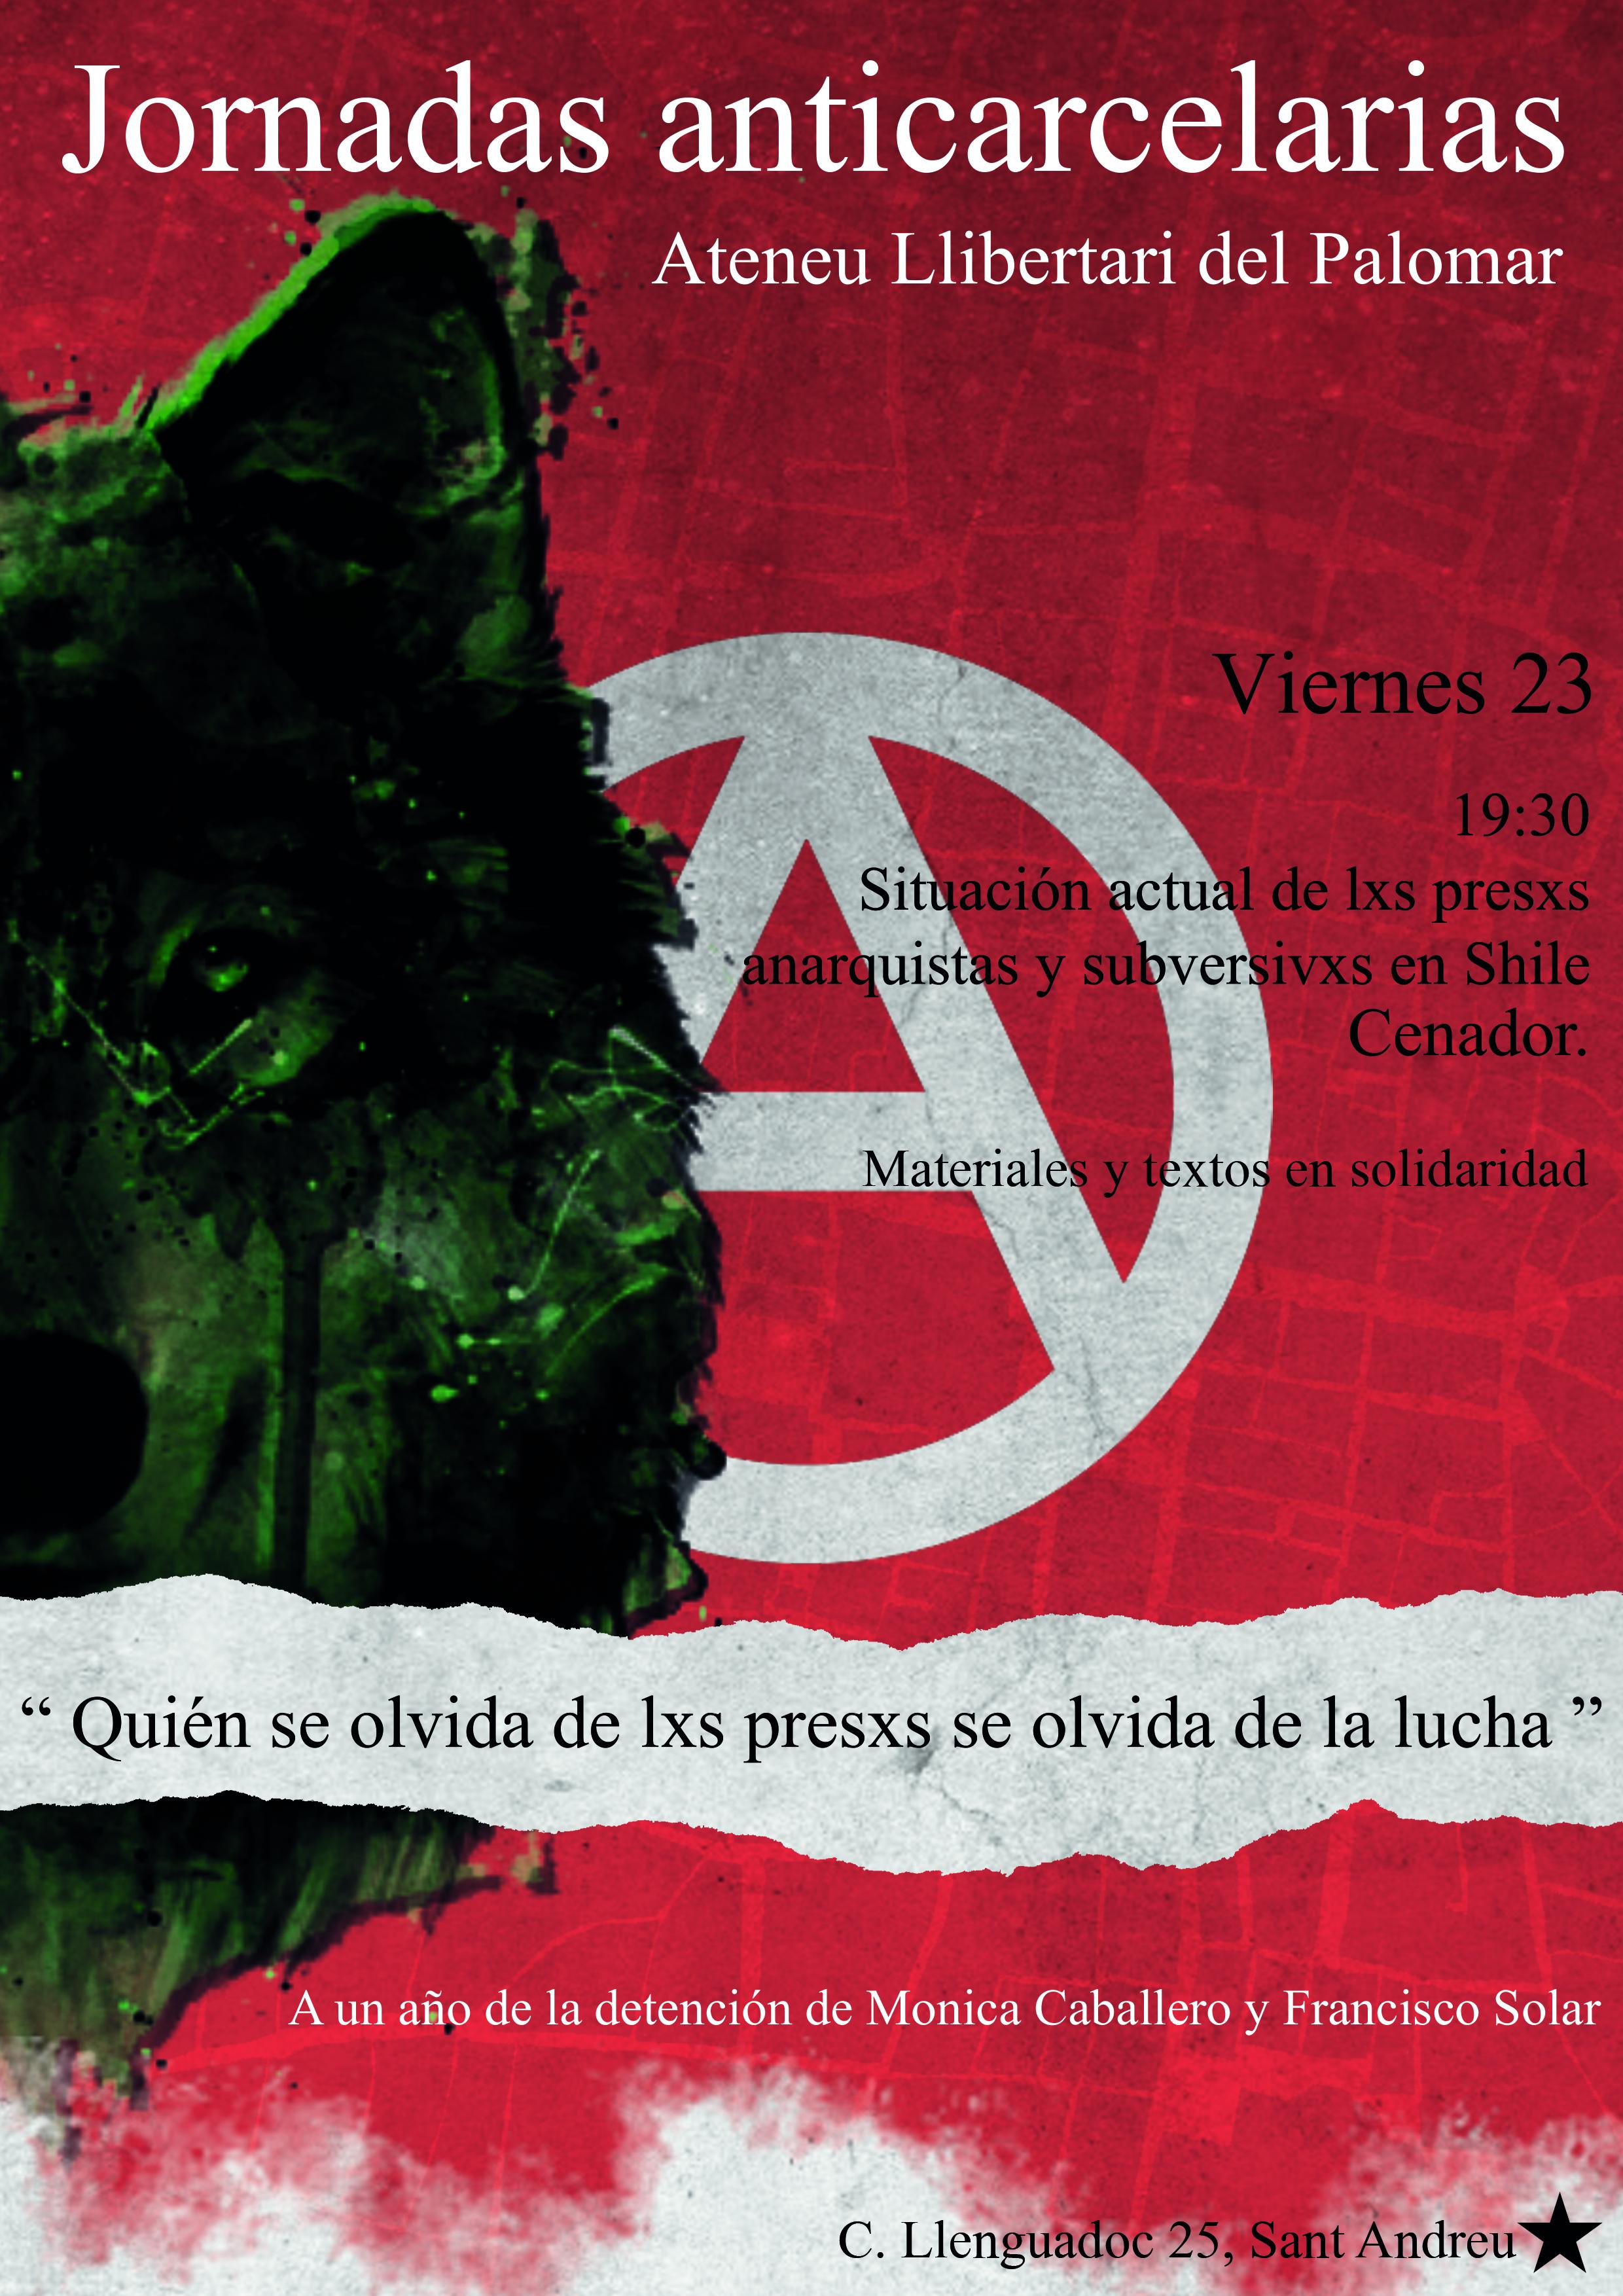 jornadas ateneo (1).jpg